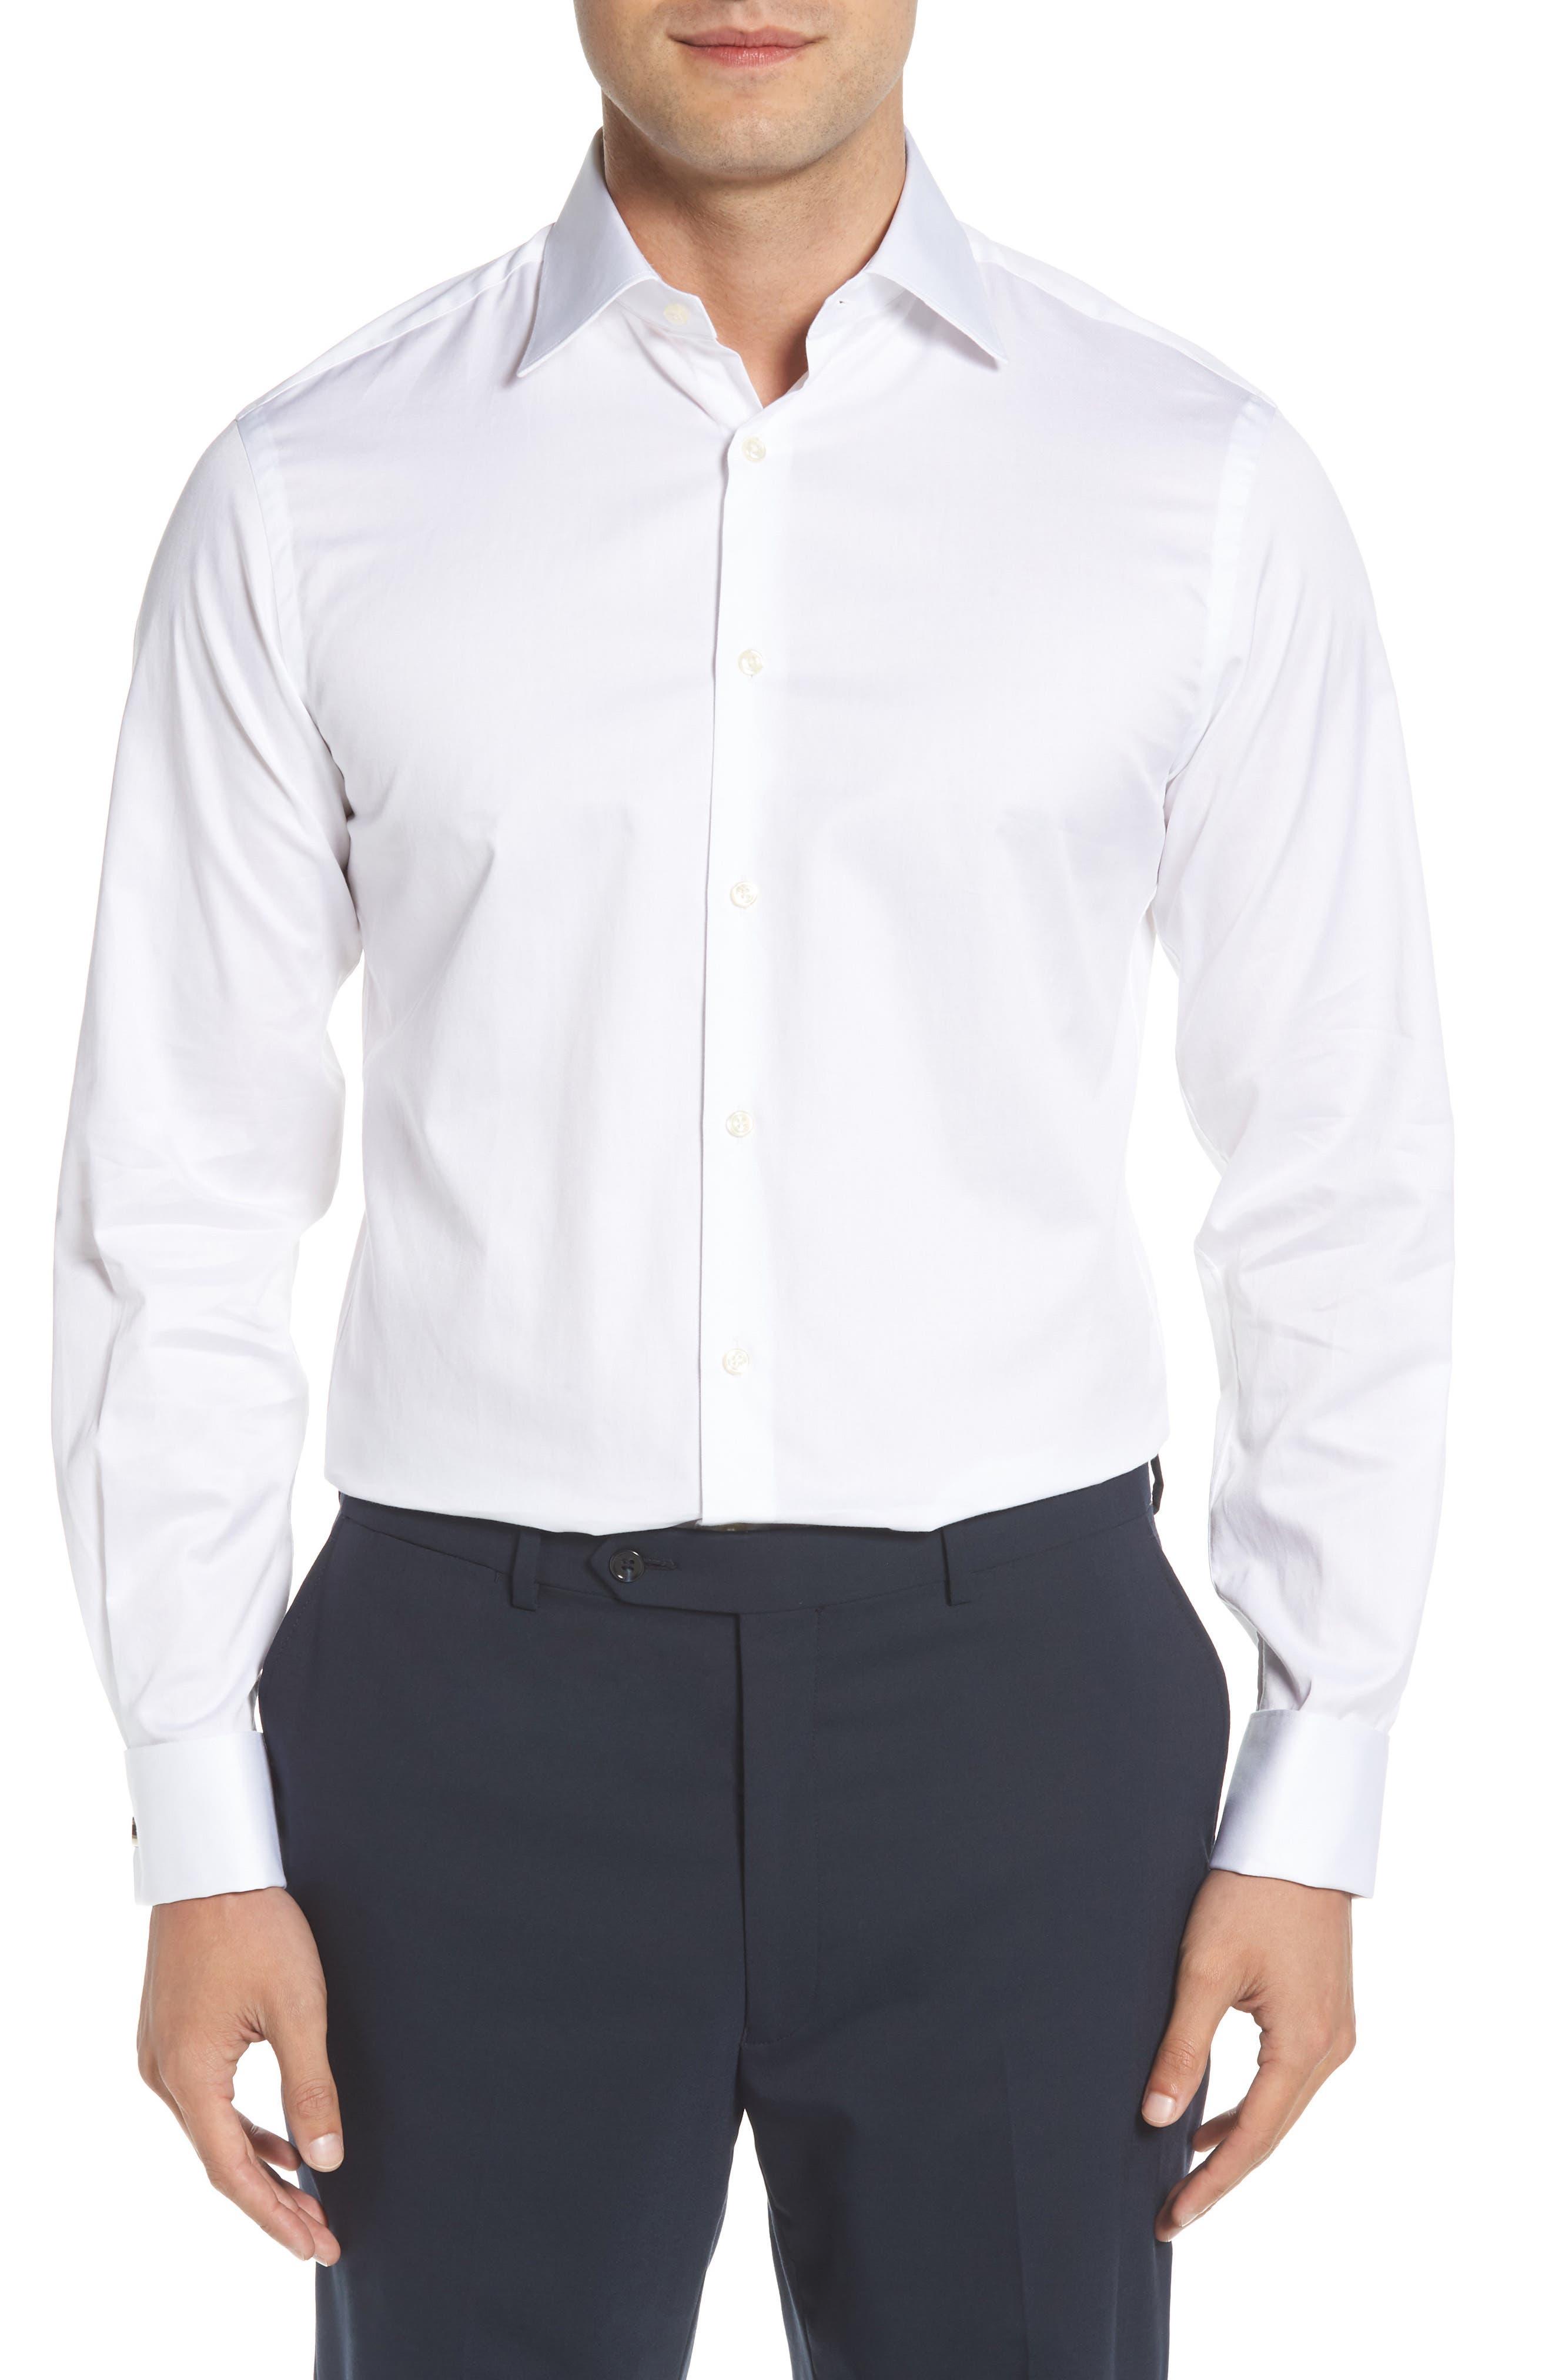 Regular Fit Solid Dress Shirt,                         Main,                         color, 100